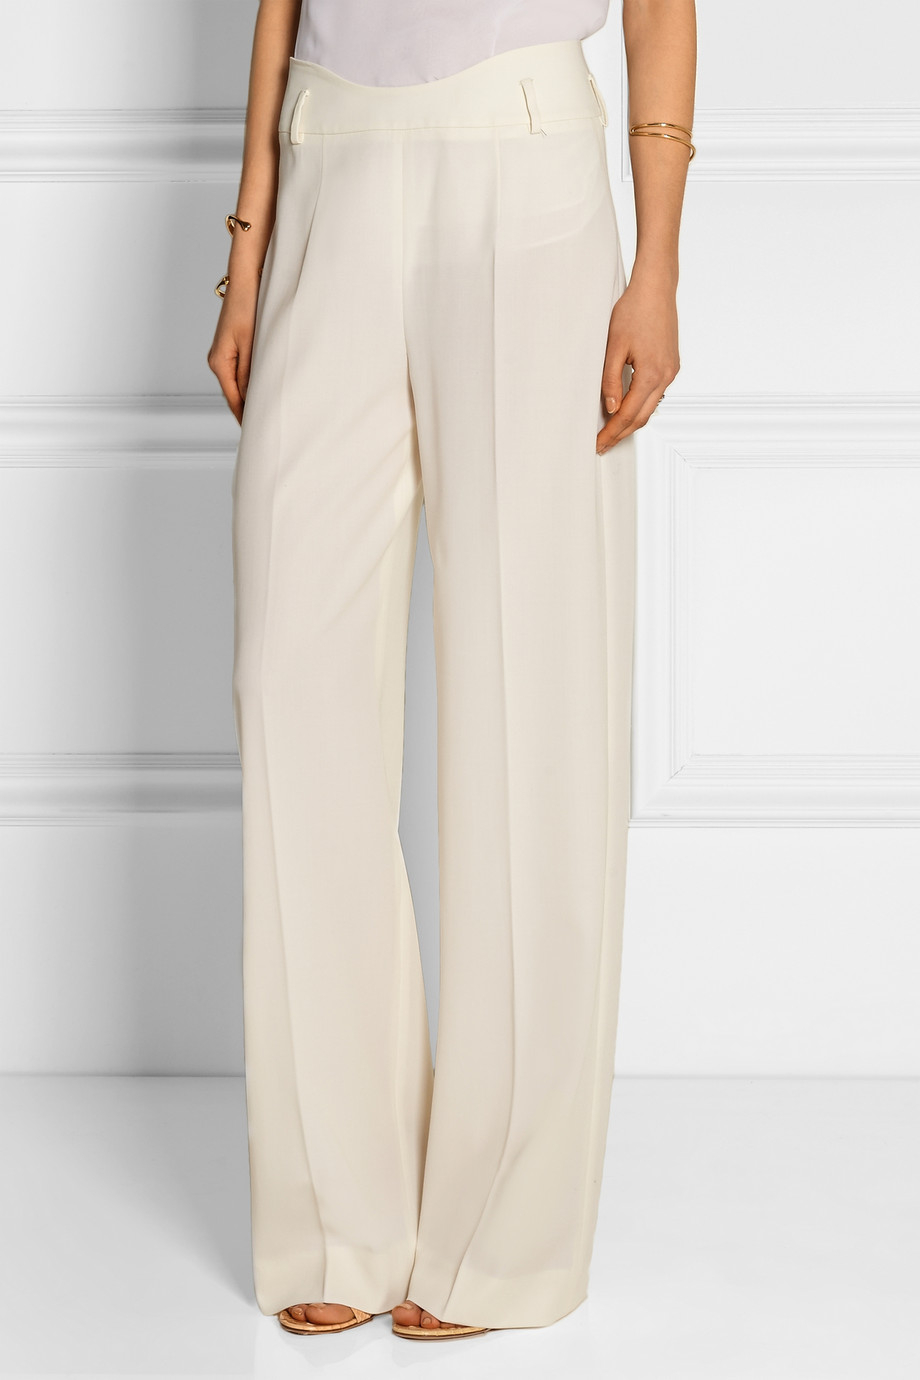 White Wool Pants Si Pant